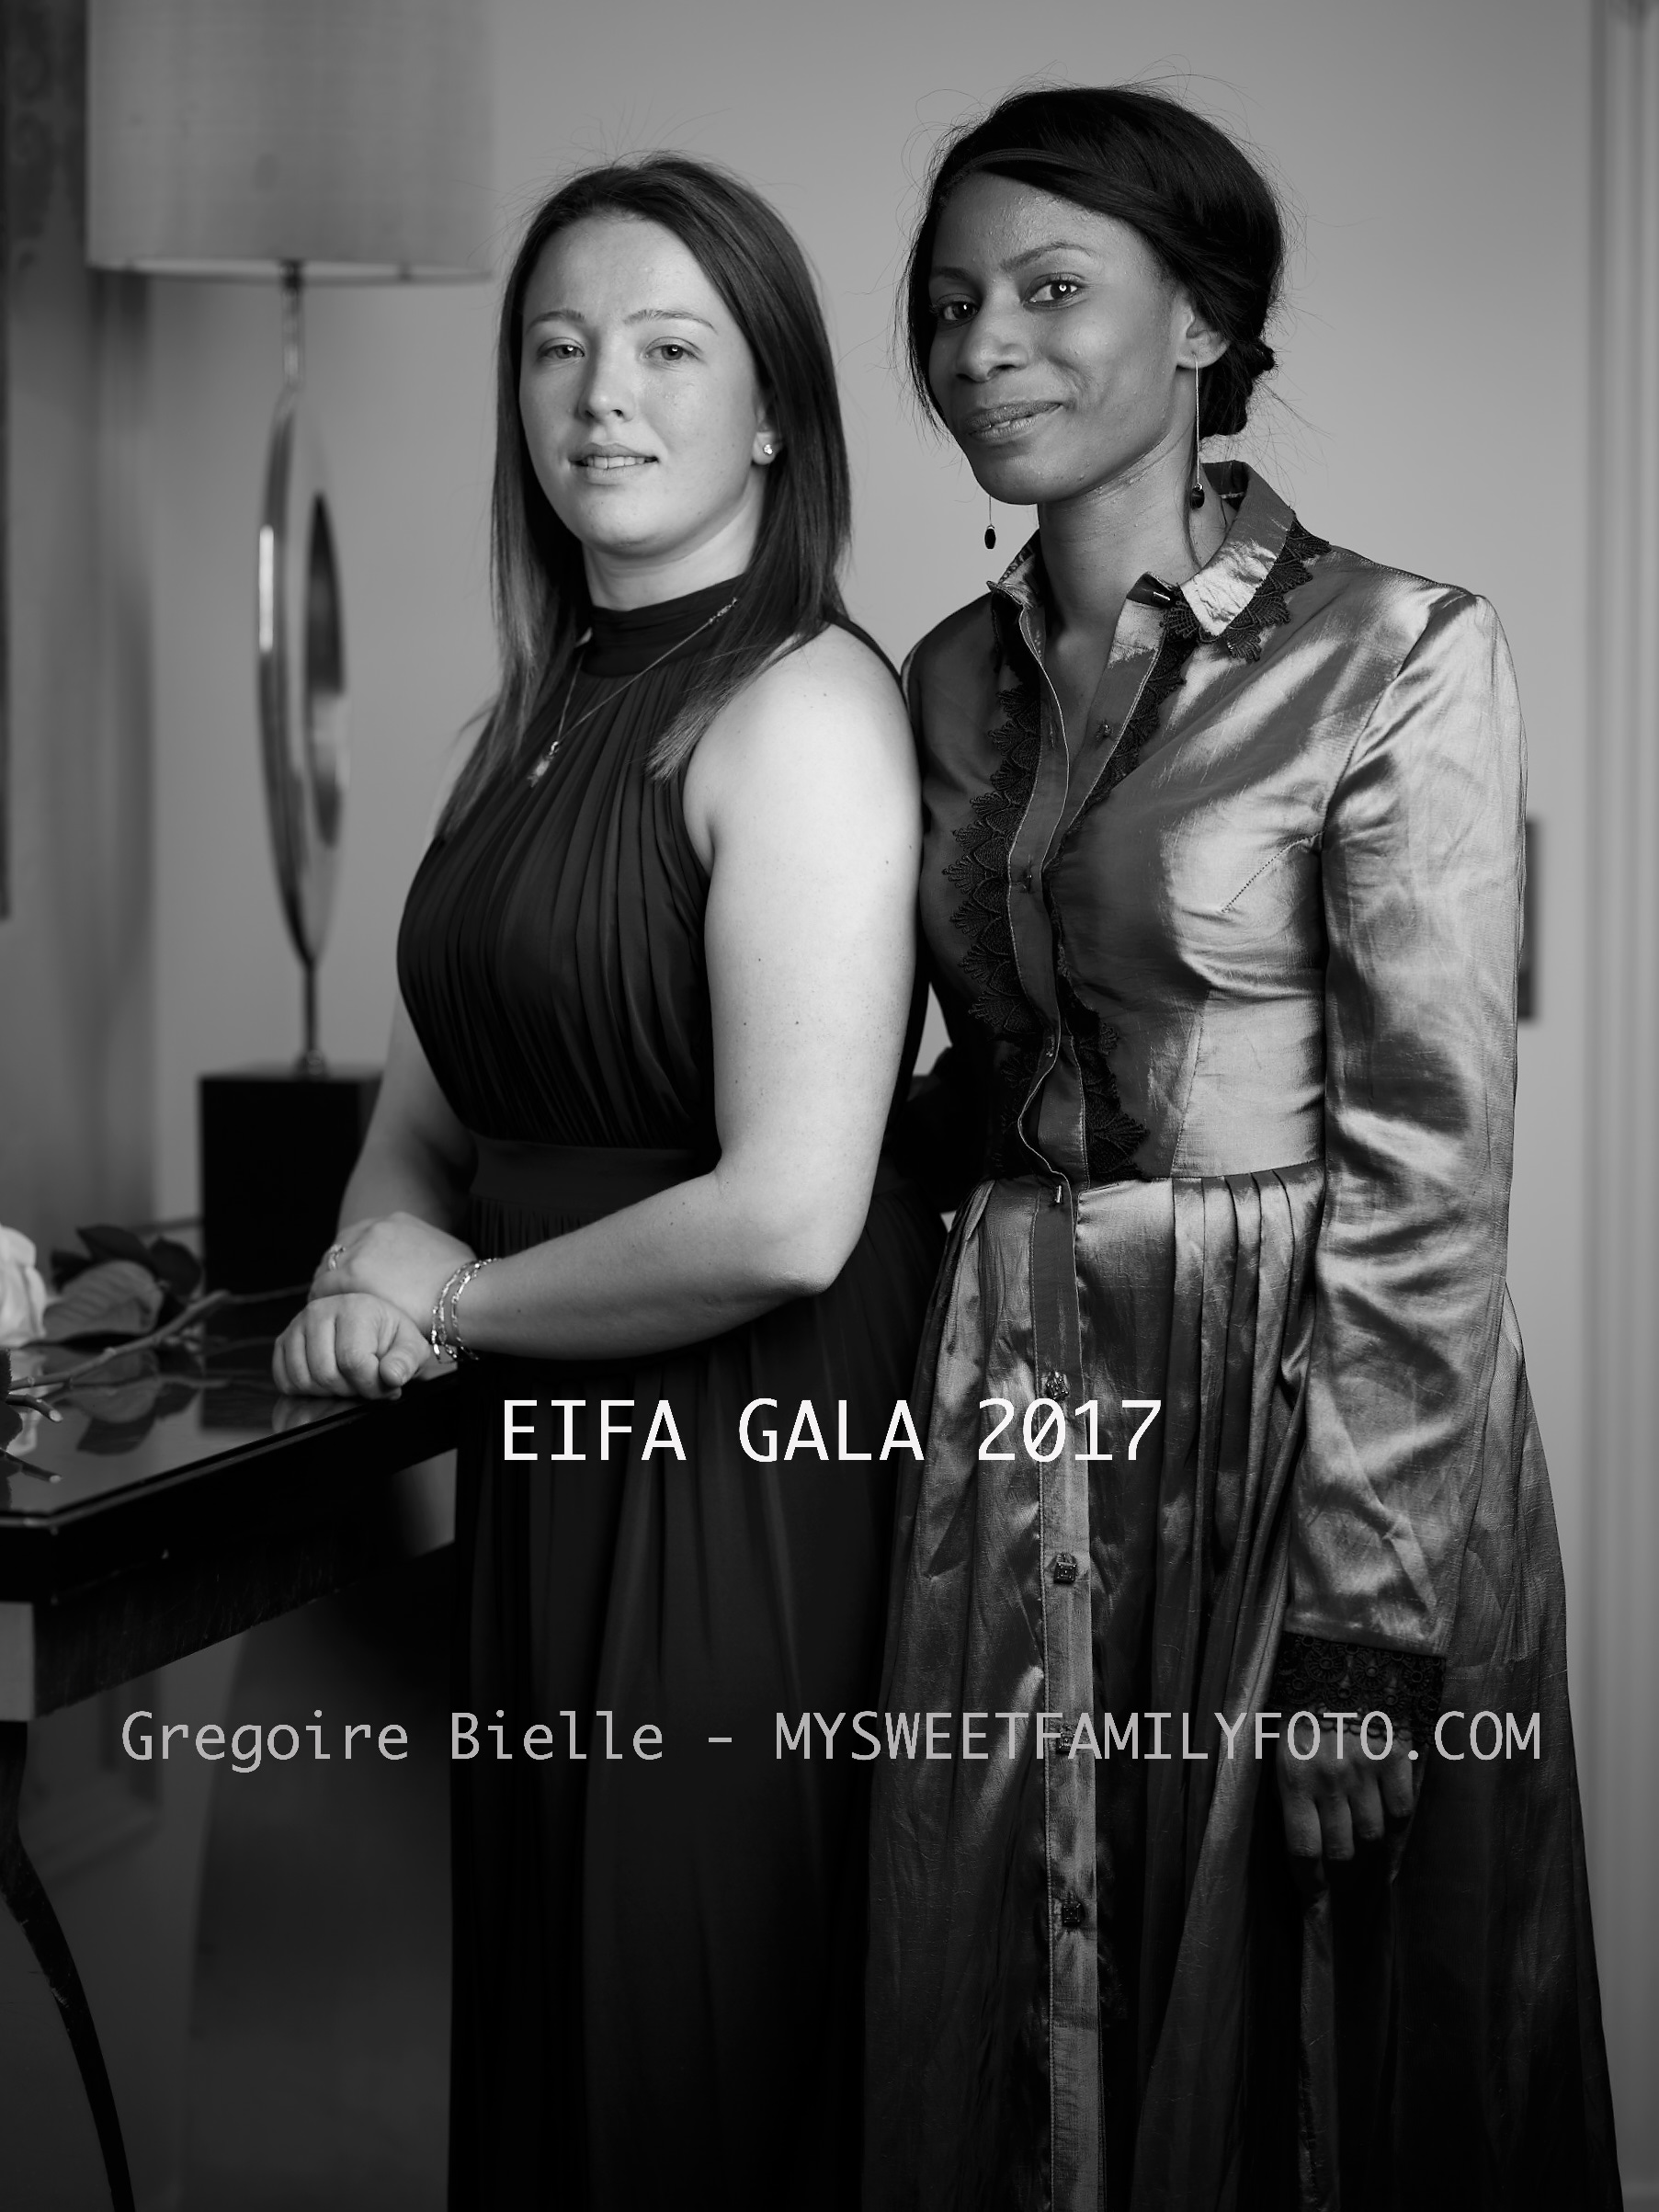 EIFA GALA 1310.jpg